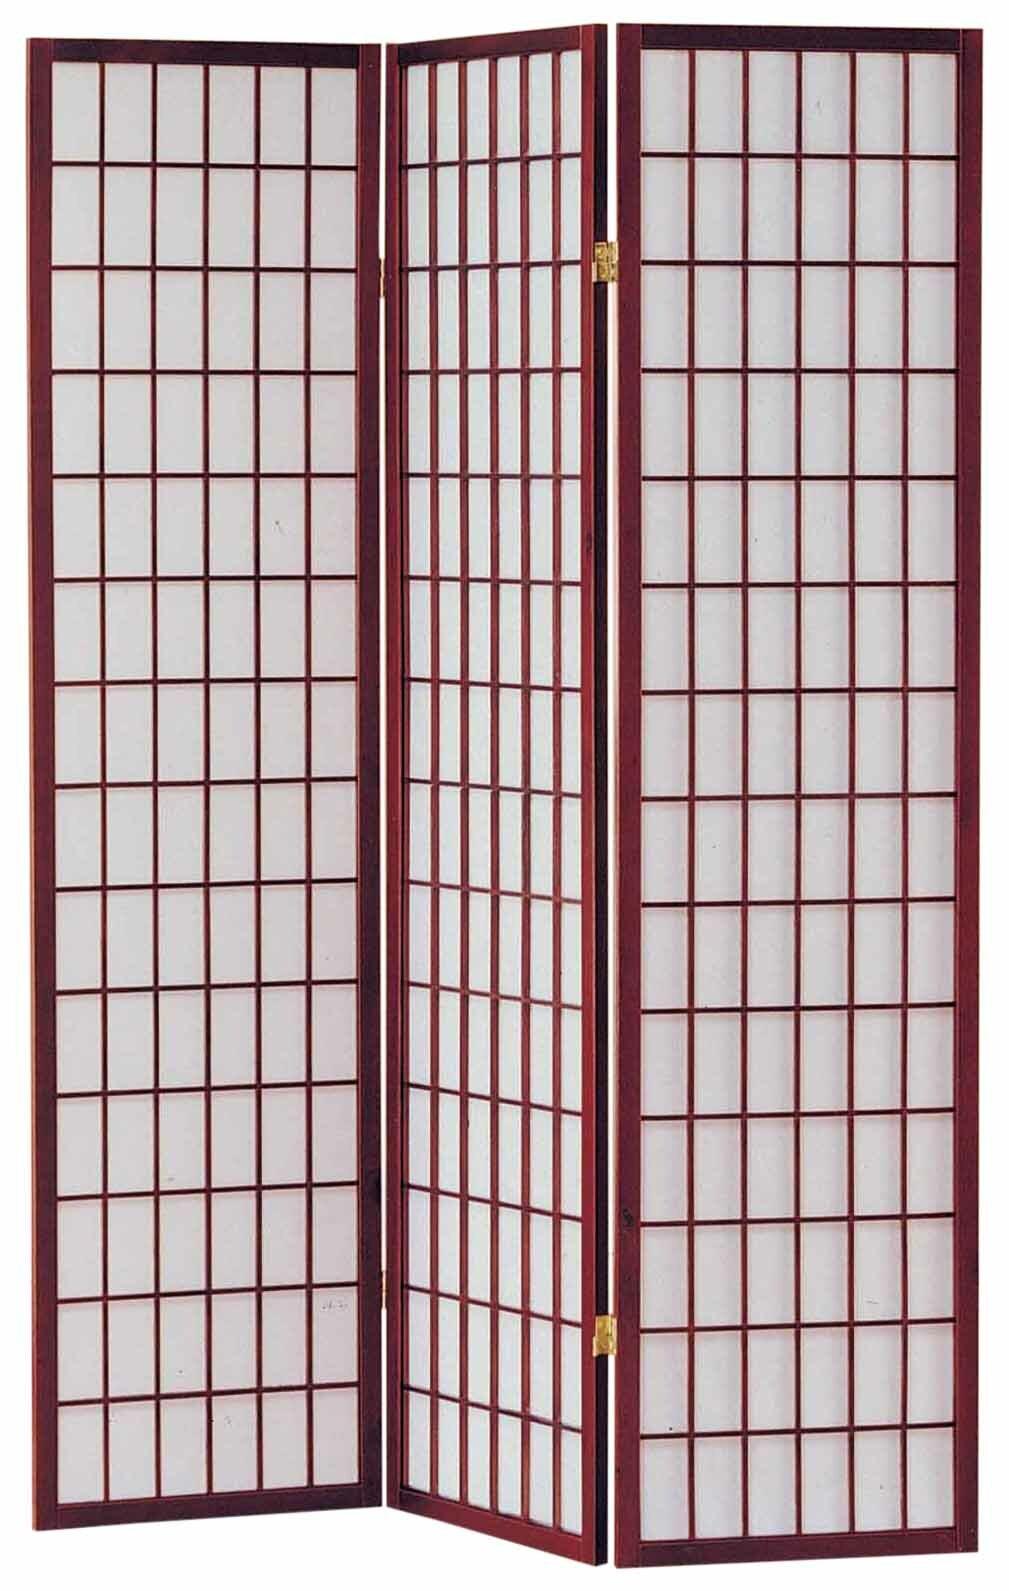 10 Panel 3-10 Panel Room Divider Square Design Cherry